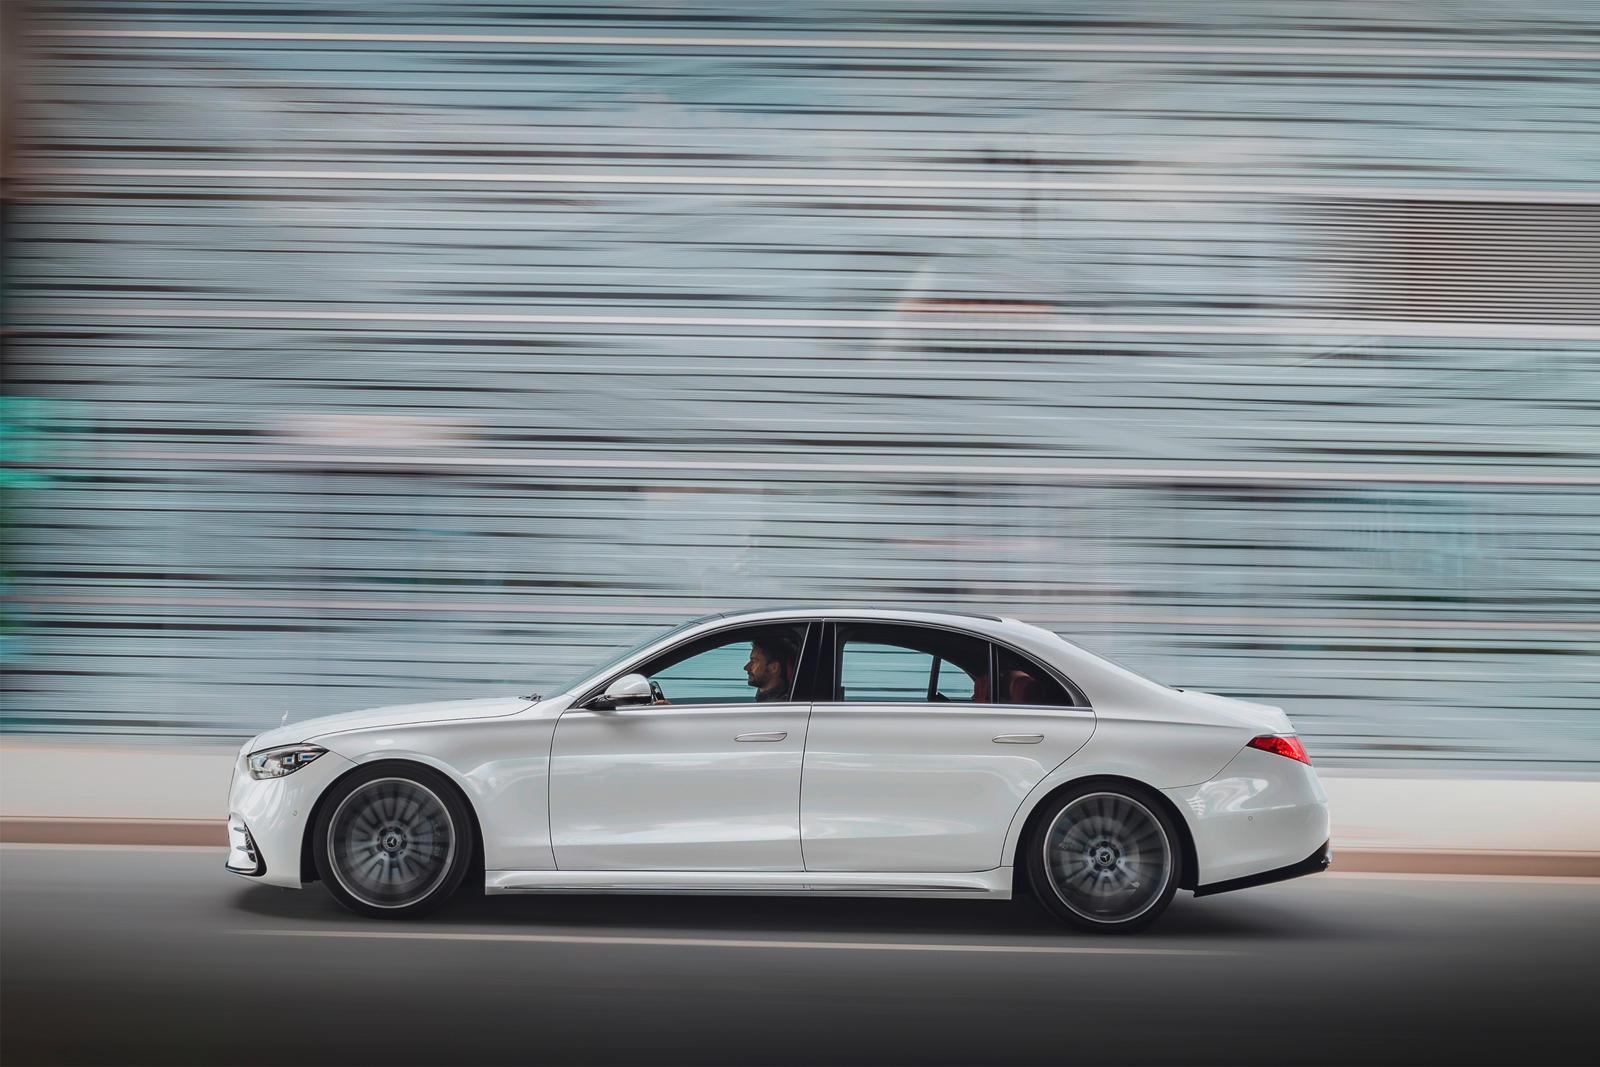 danh gia Mercedes-Benz S-Class 2021 anh 7